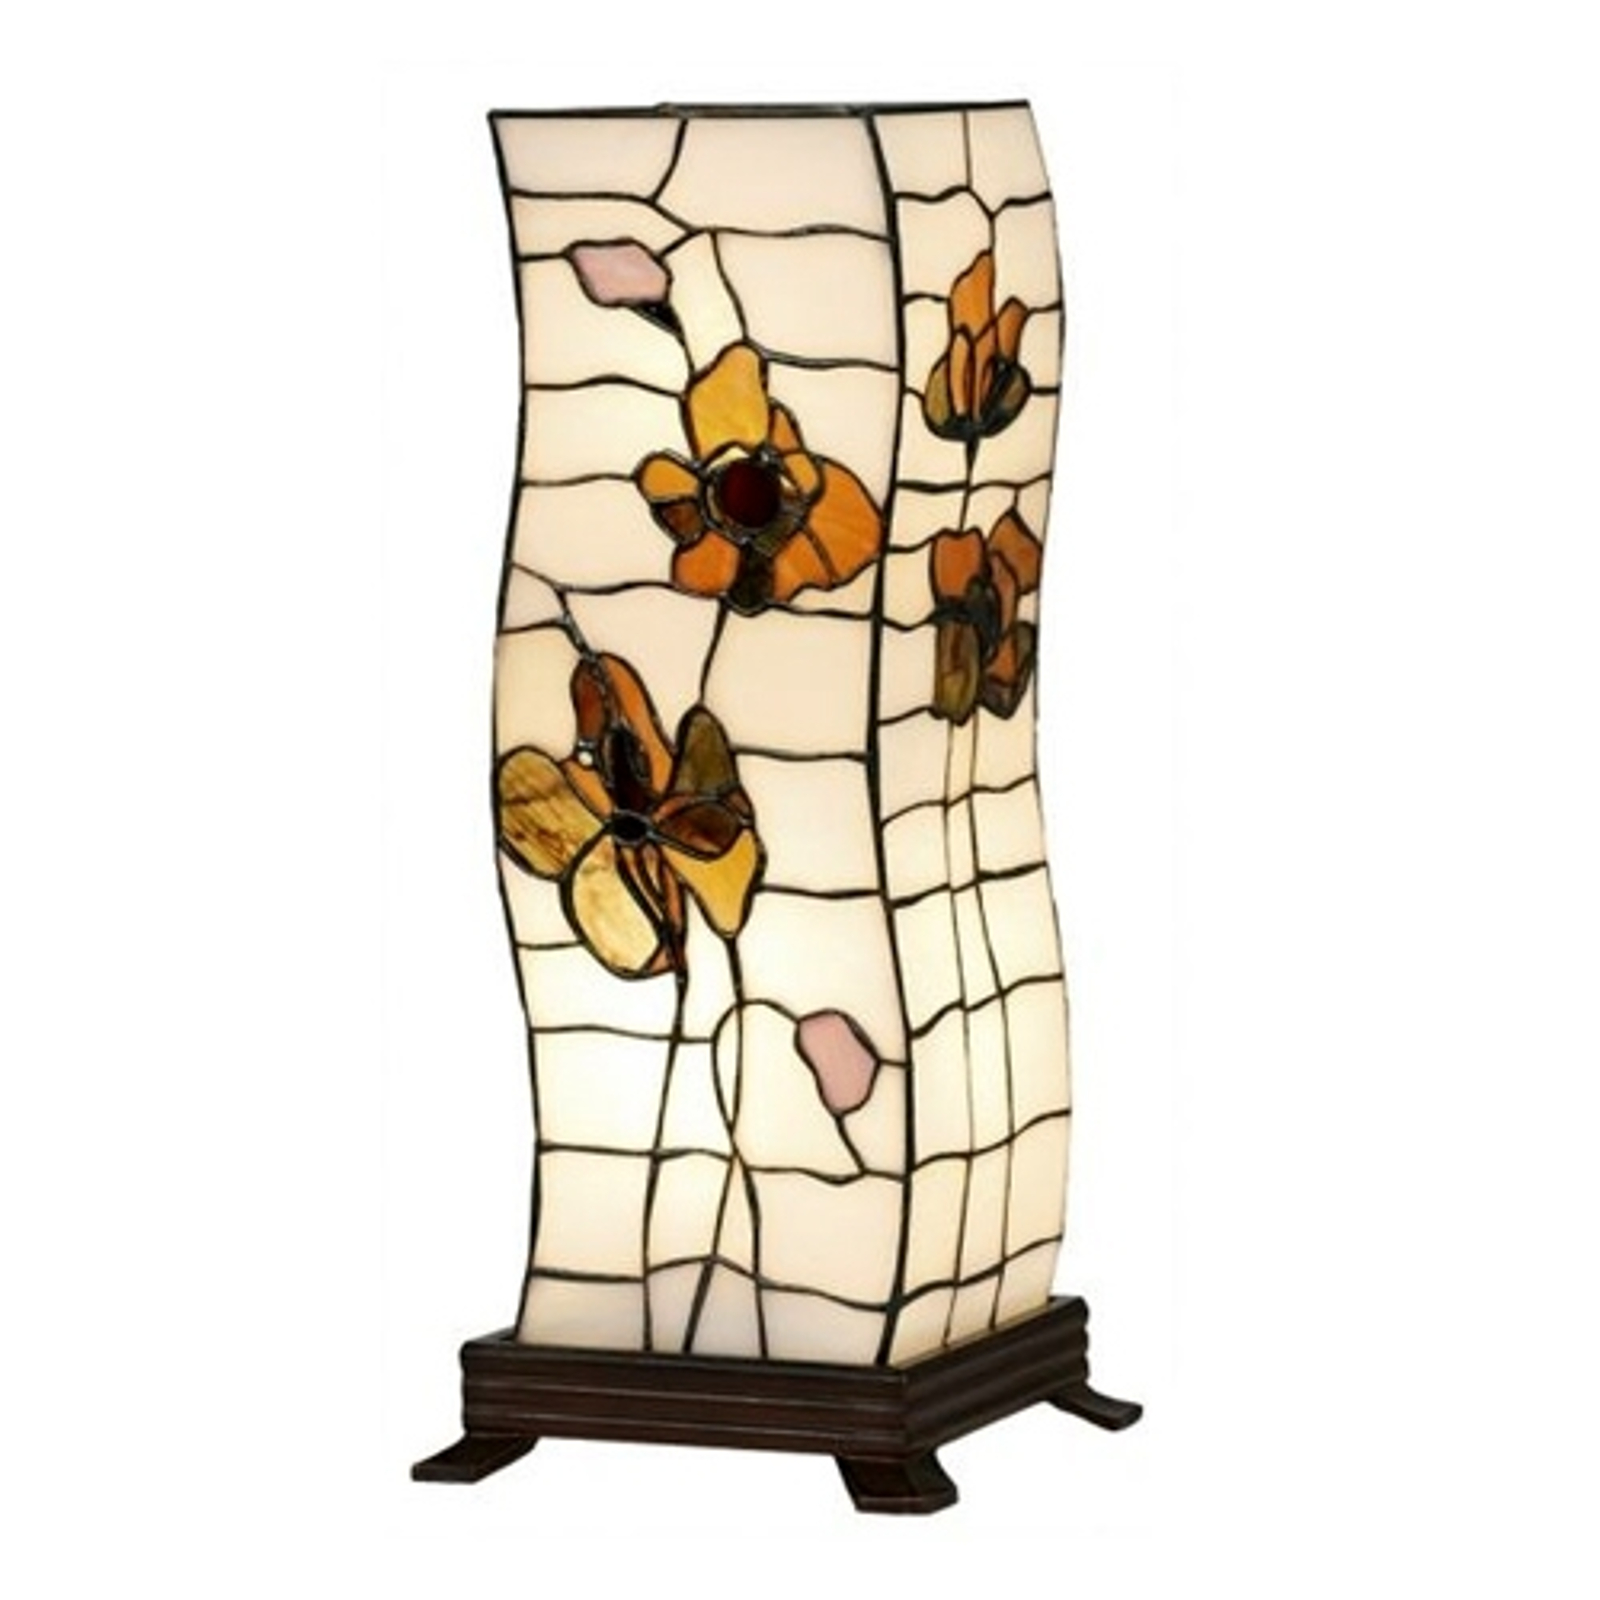 Bordslampa Blossom i tiffanystil